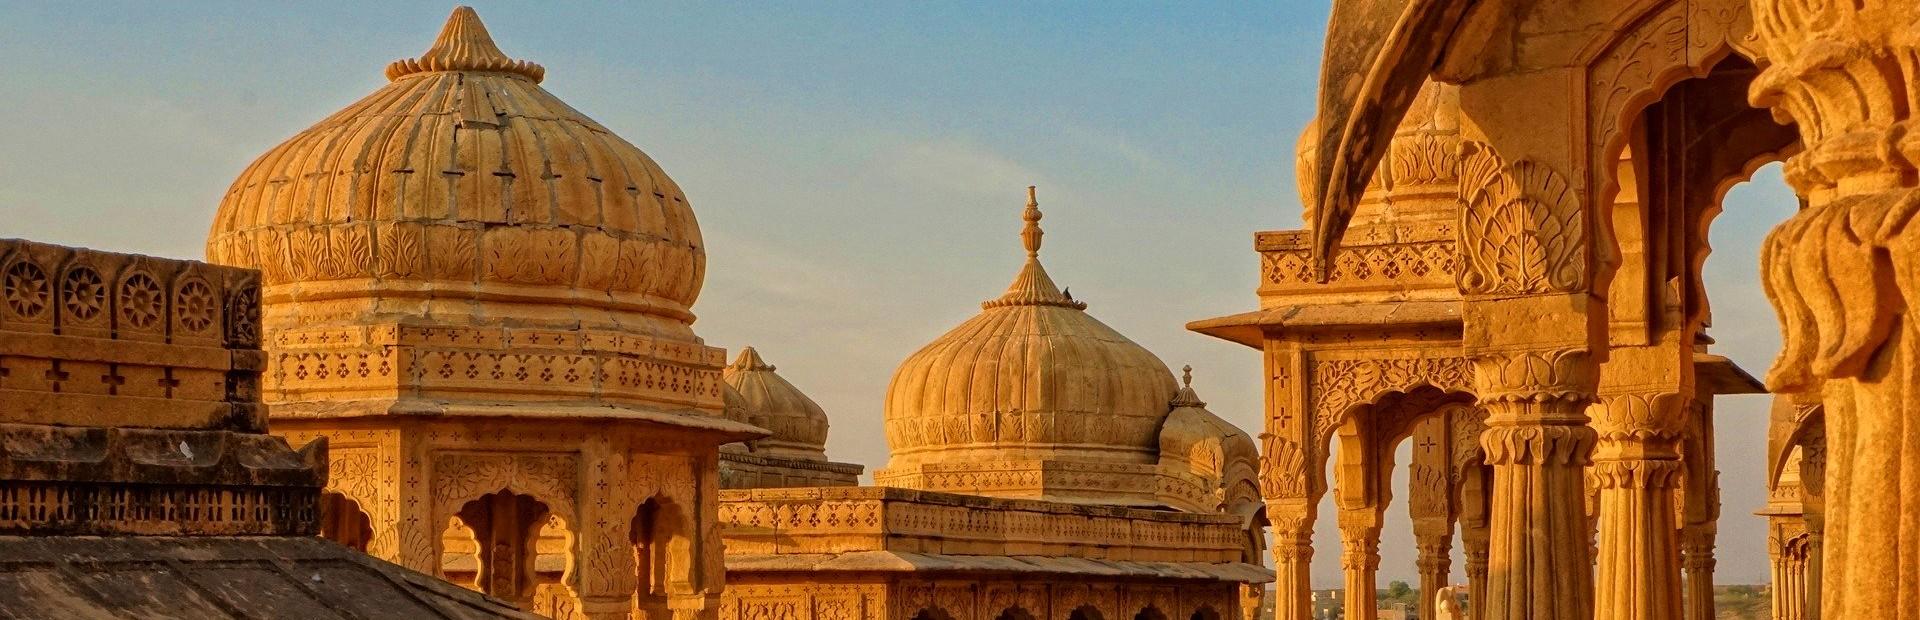 India reisblog